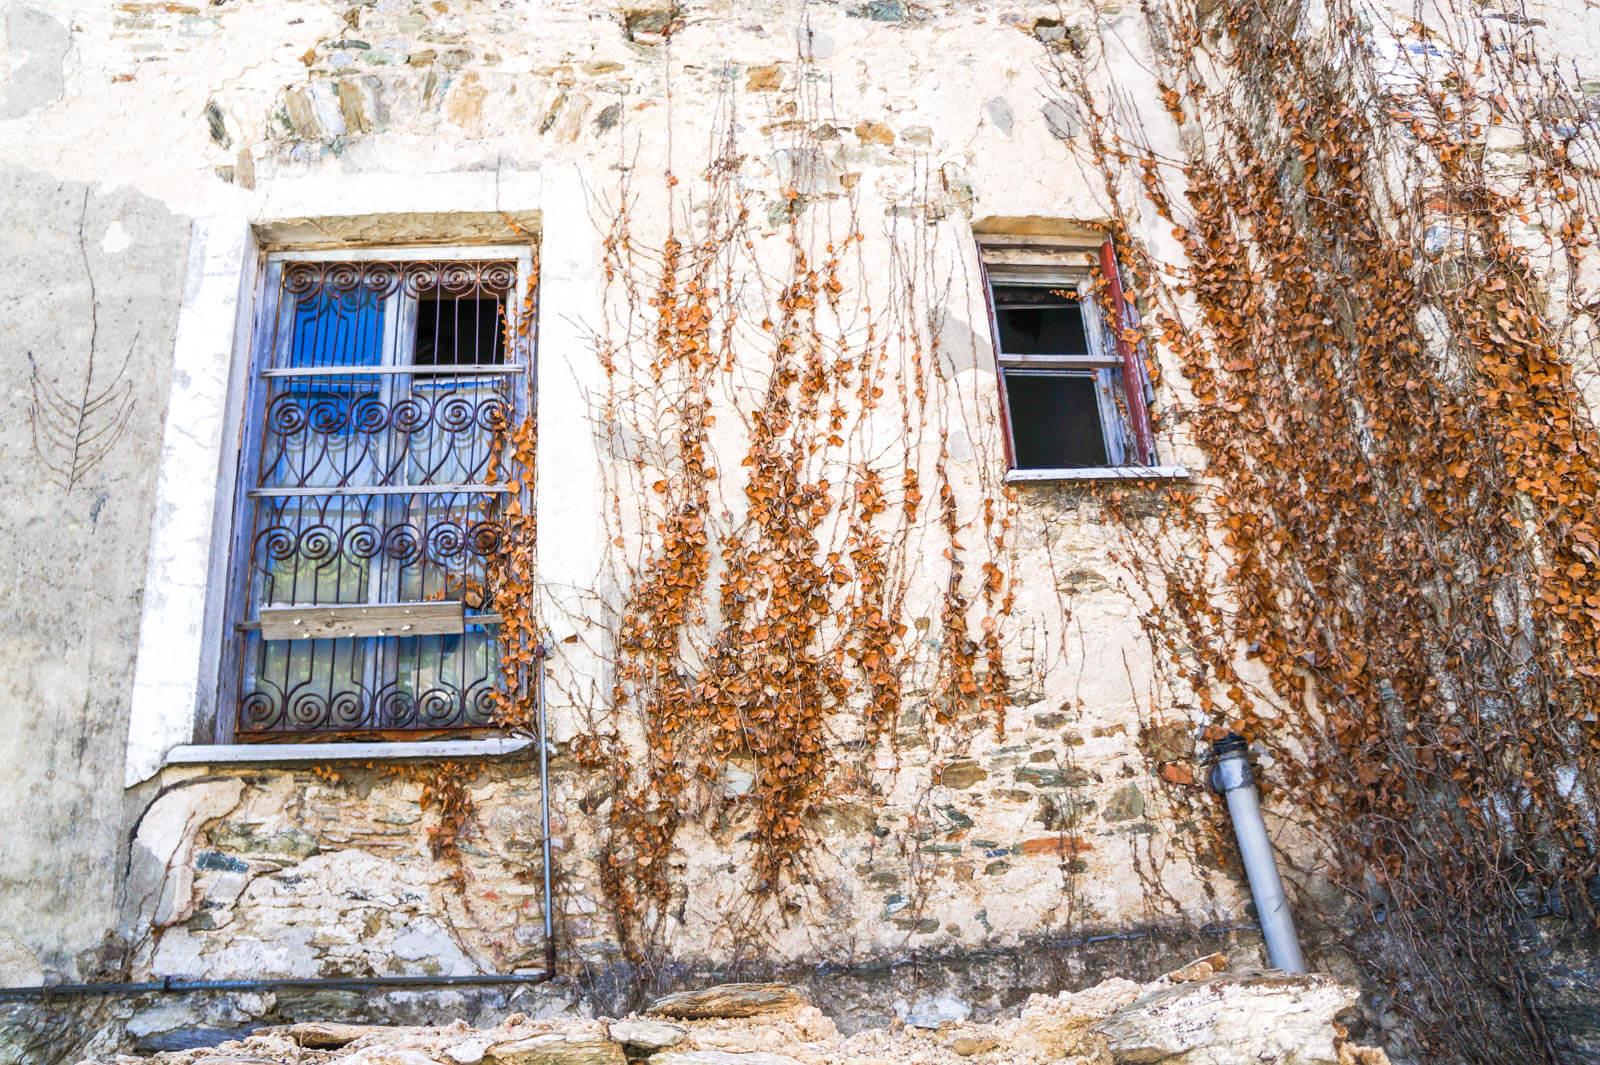 portaria-pelion-greece-la-vie-en-blog-all-rights-reserved-8